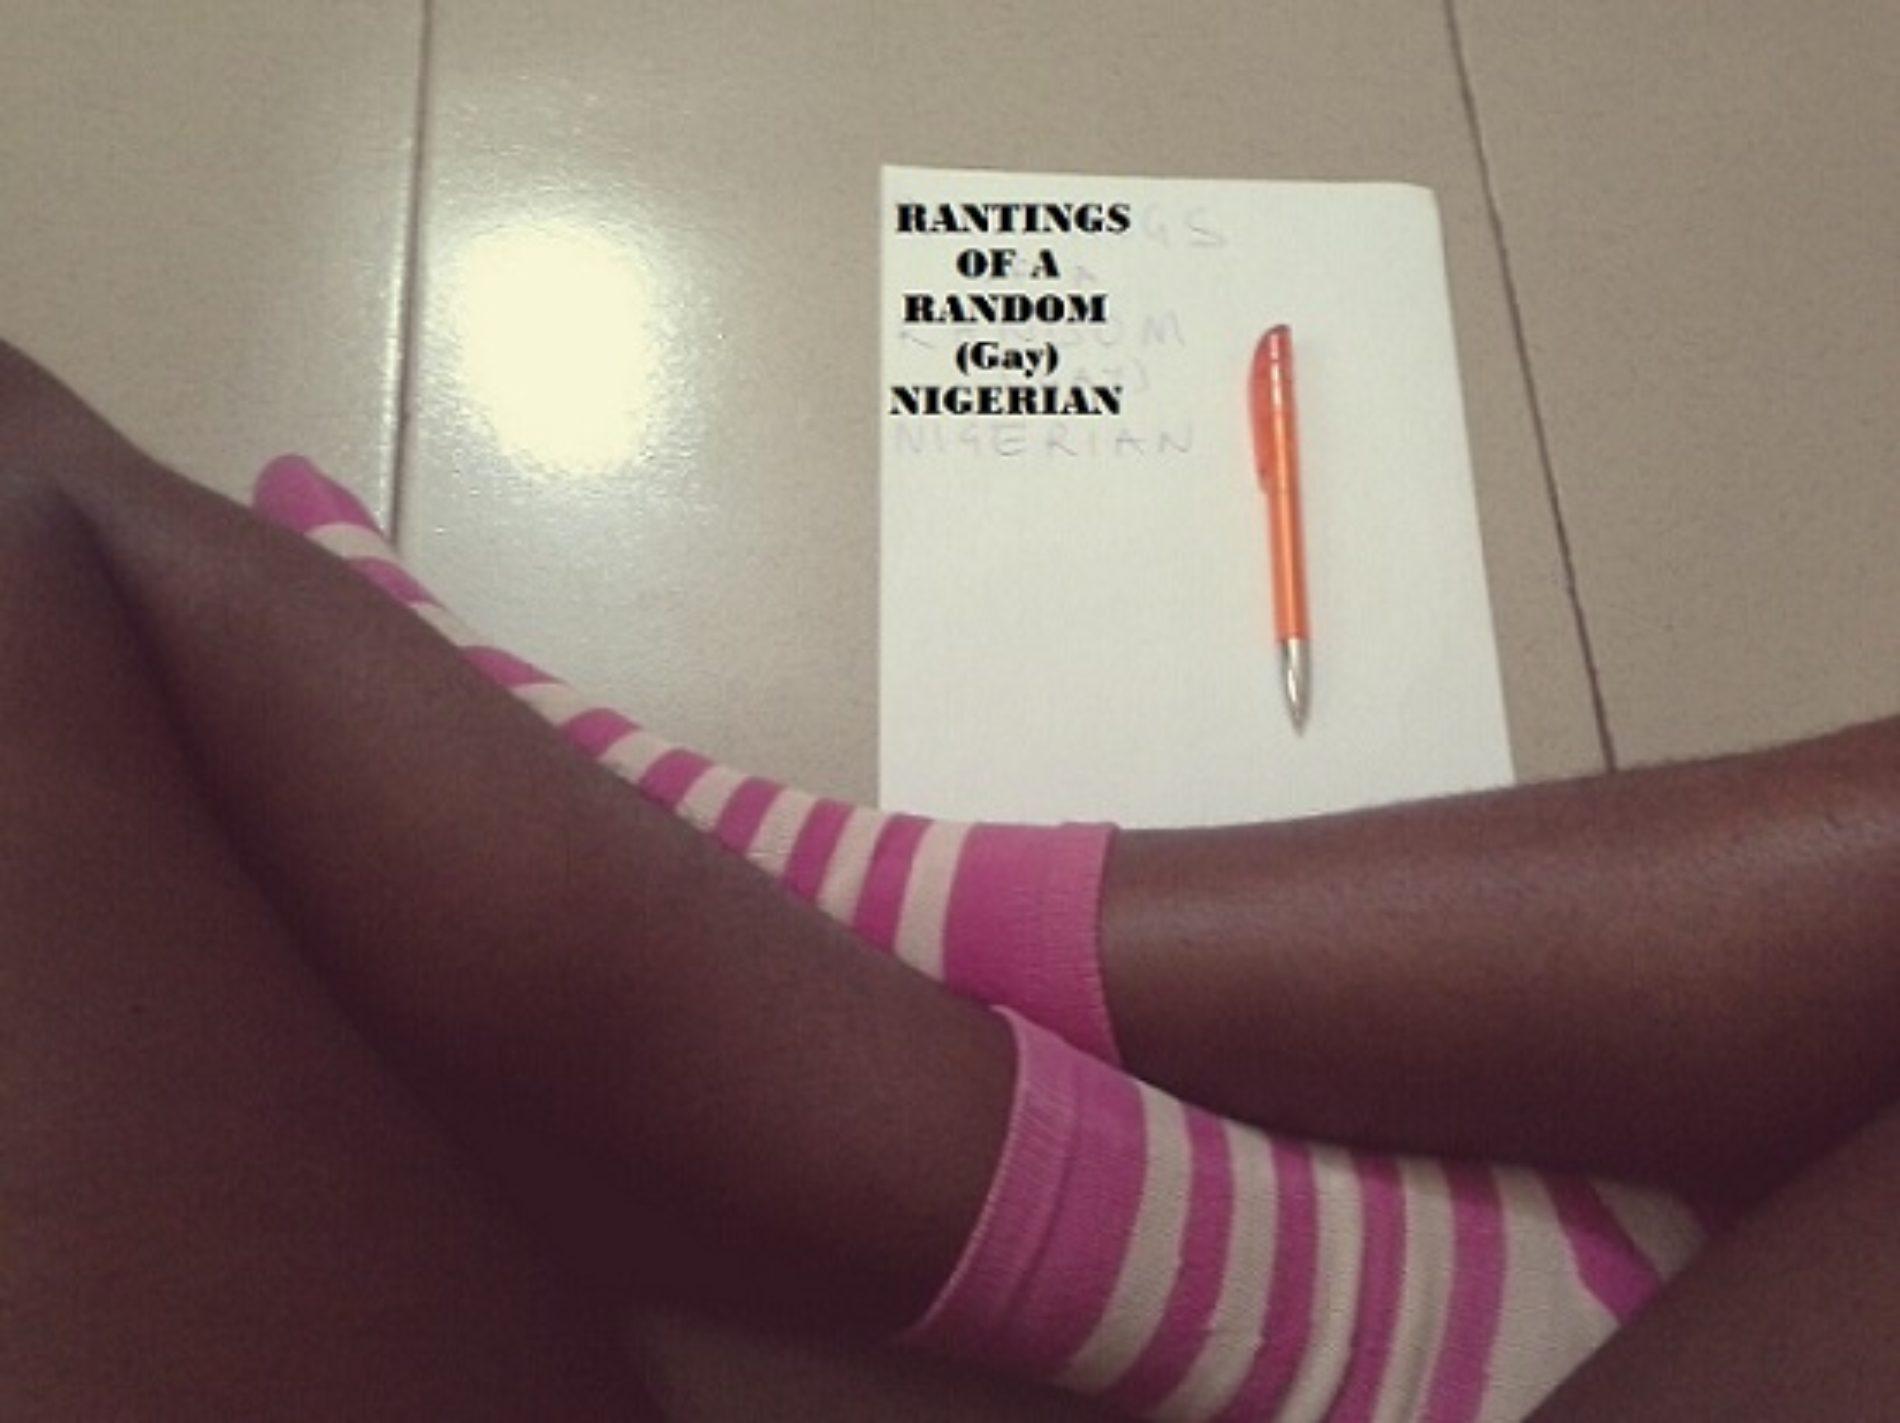 RANTINGS OF A RANDOM (Gay) NIGERIAN (Entry 8)